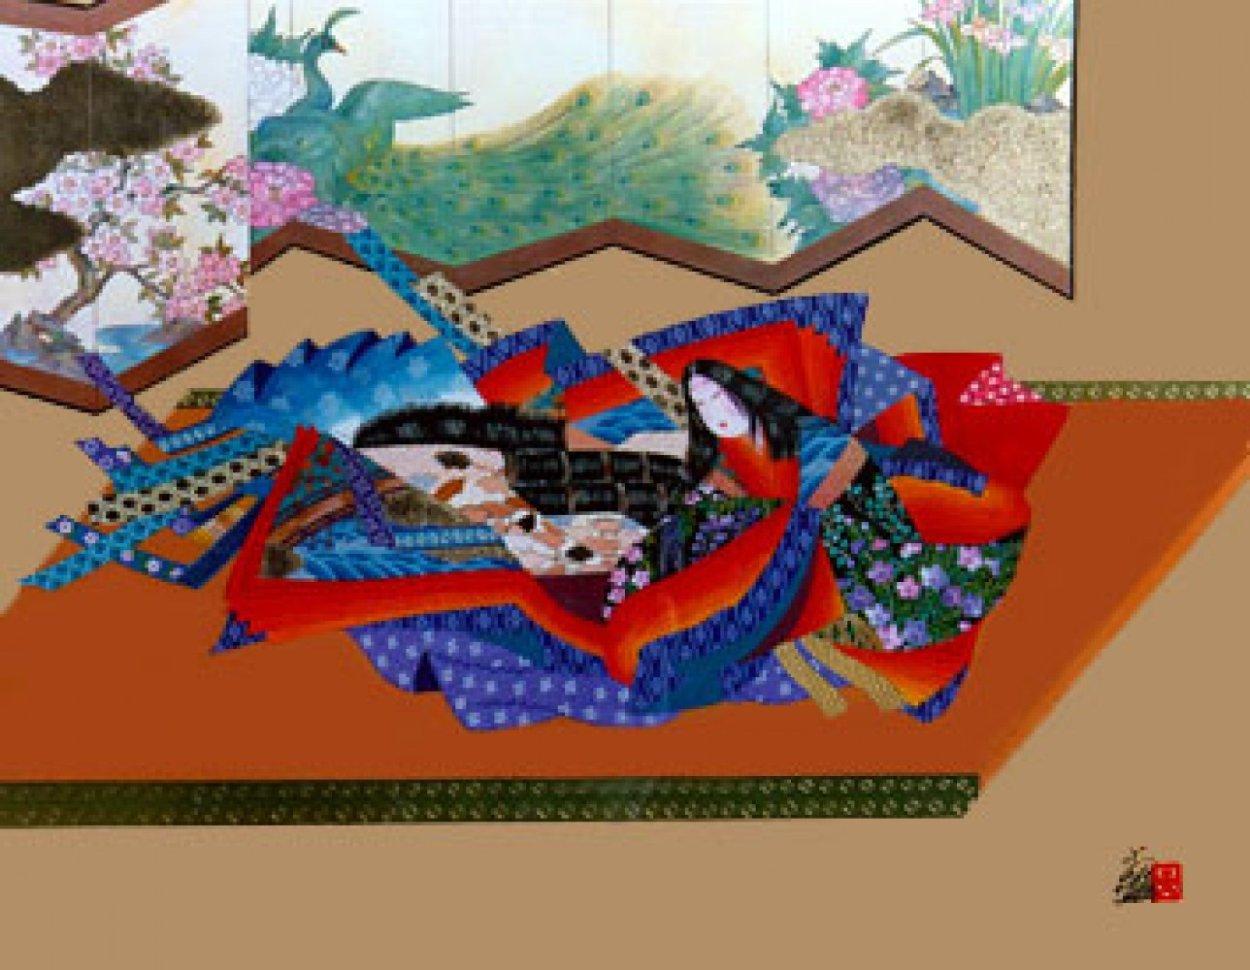 Sei Shonagon 1986 Limited Edition Print by Hisashi Otsuka